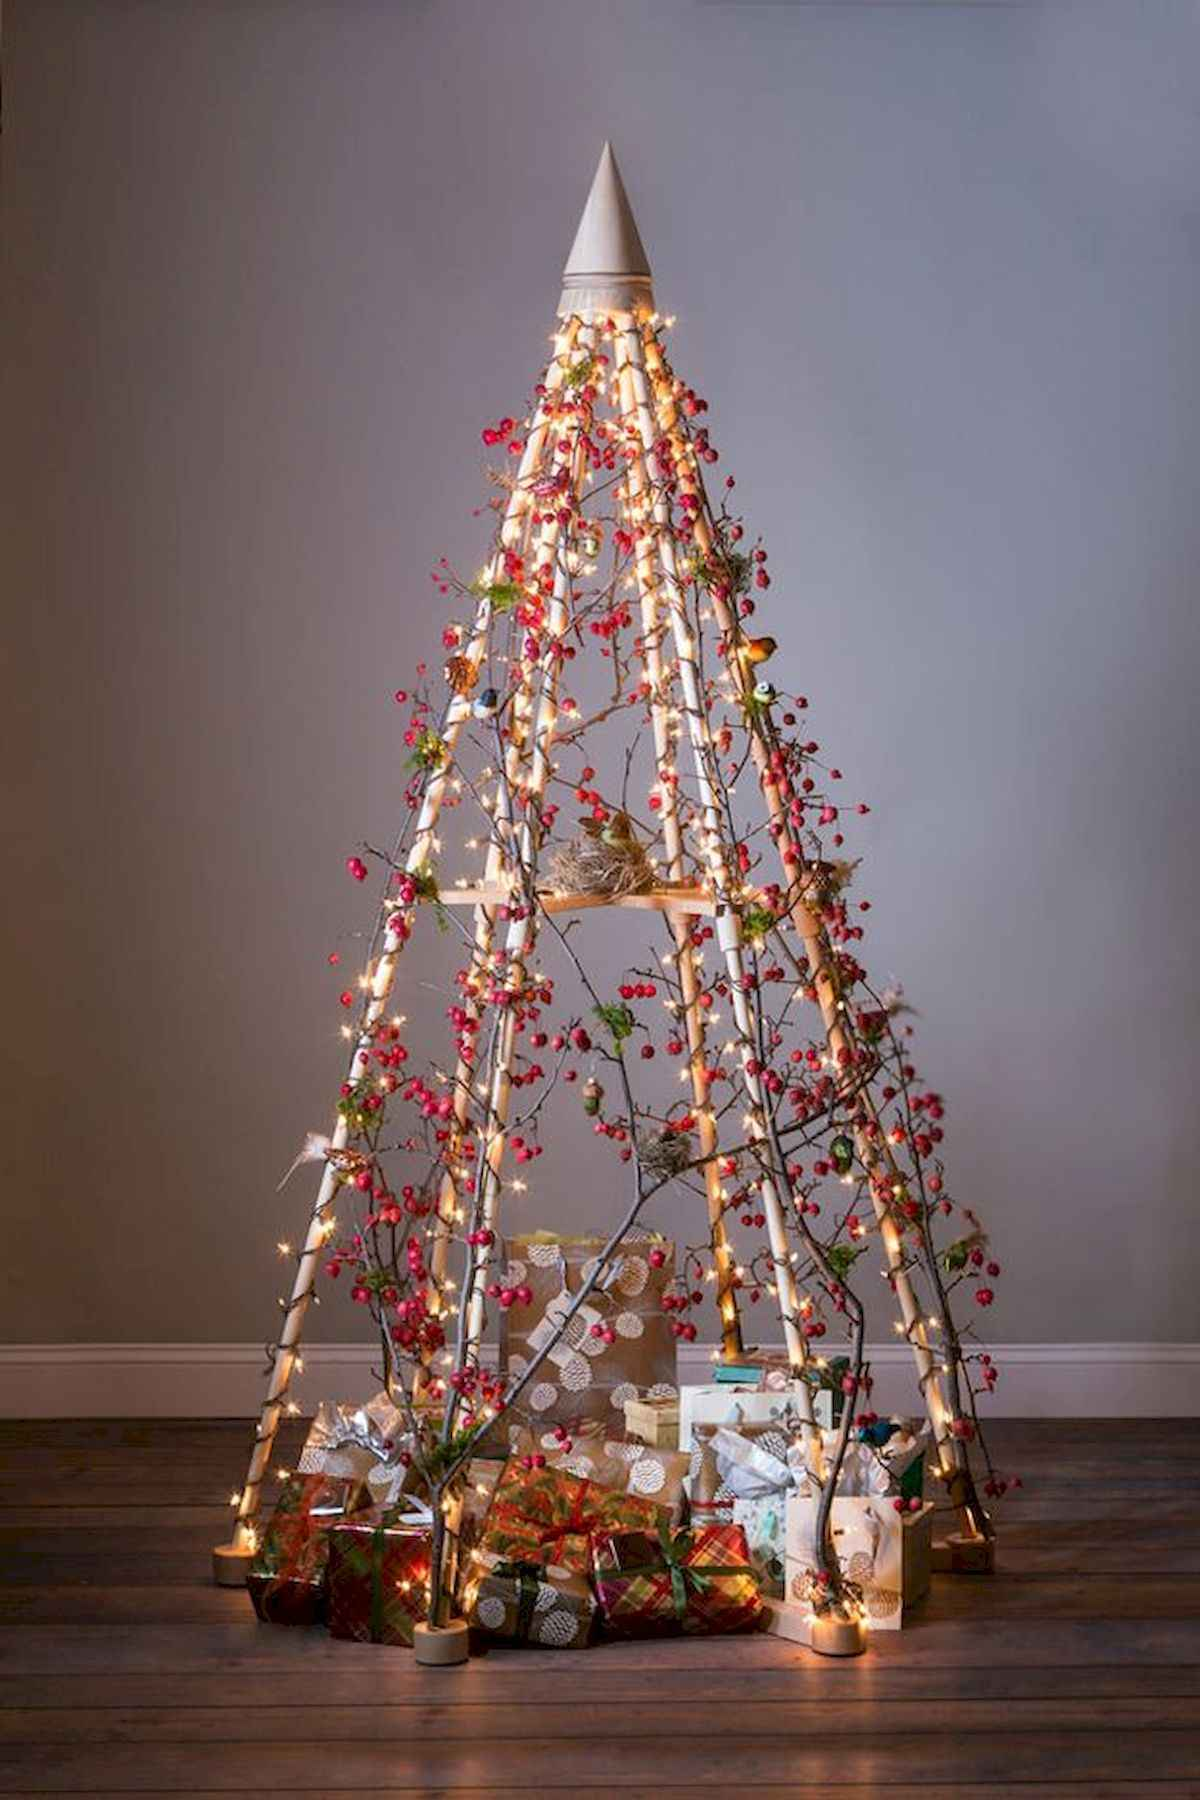 50 diy christmas decorations ideas (28)